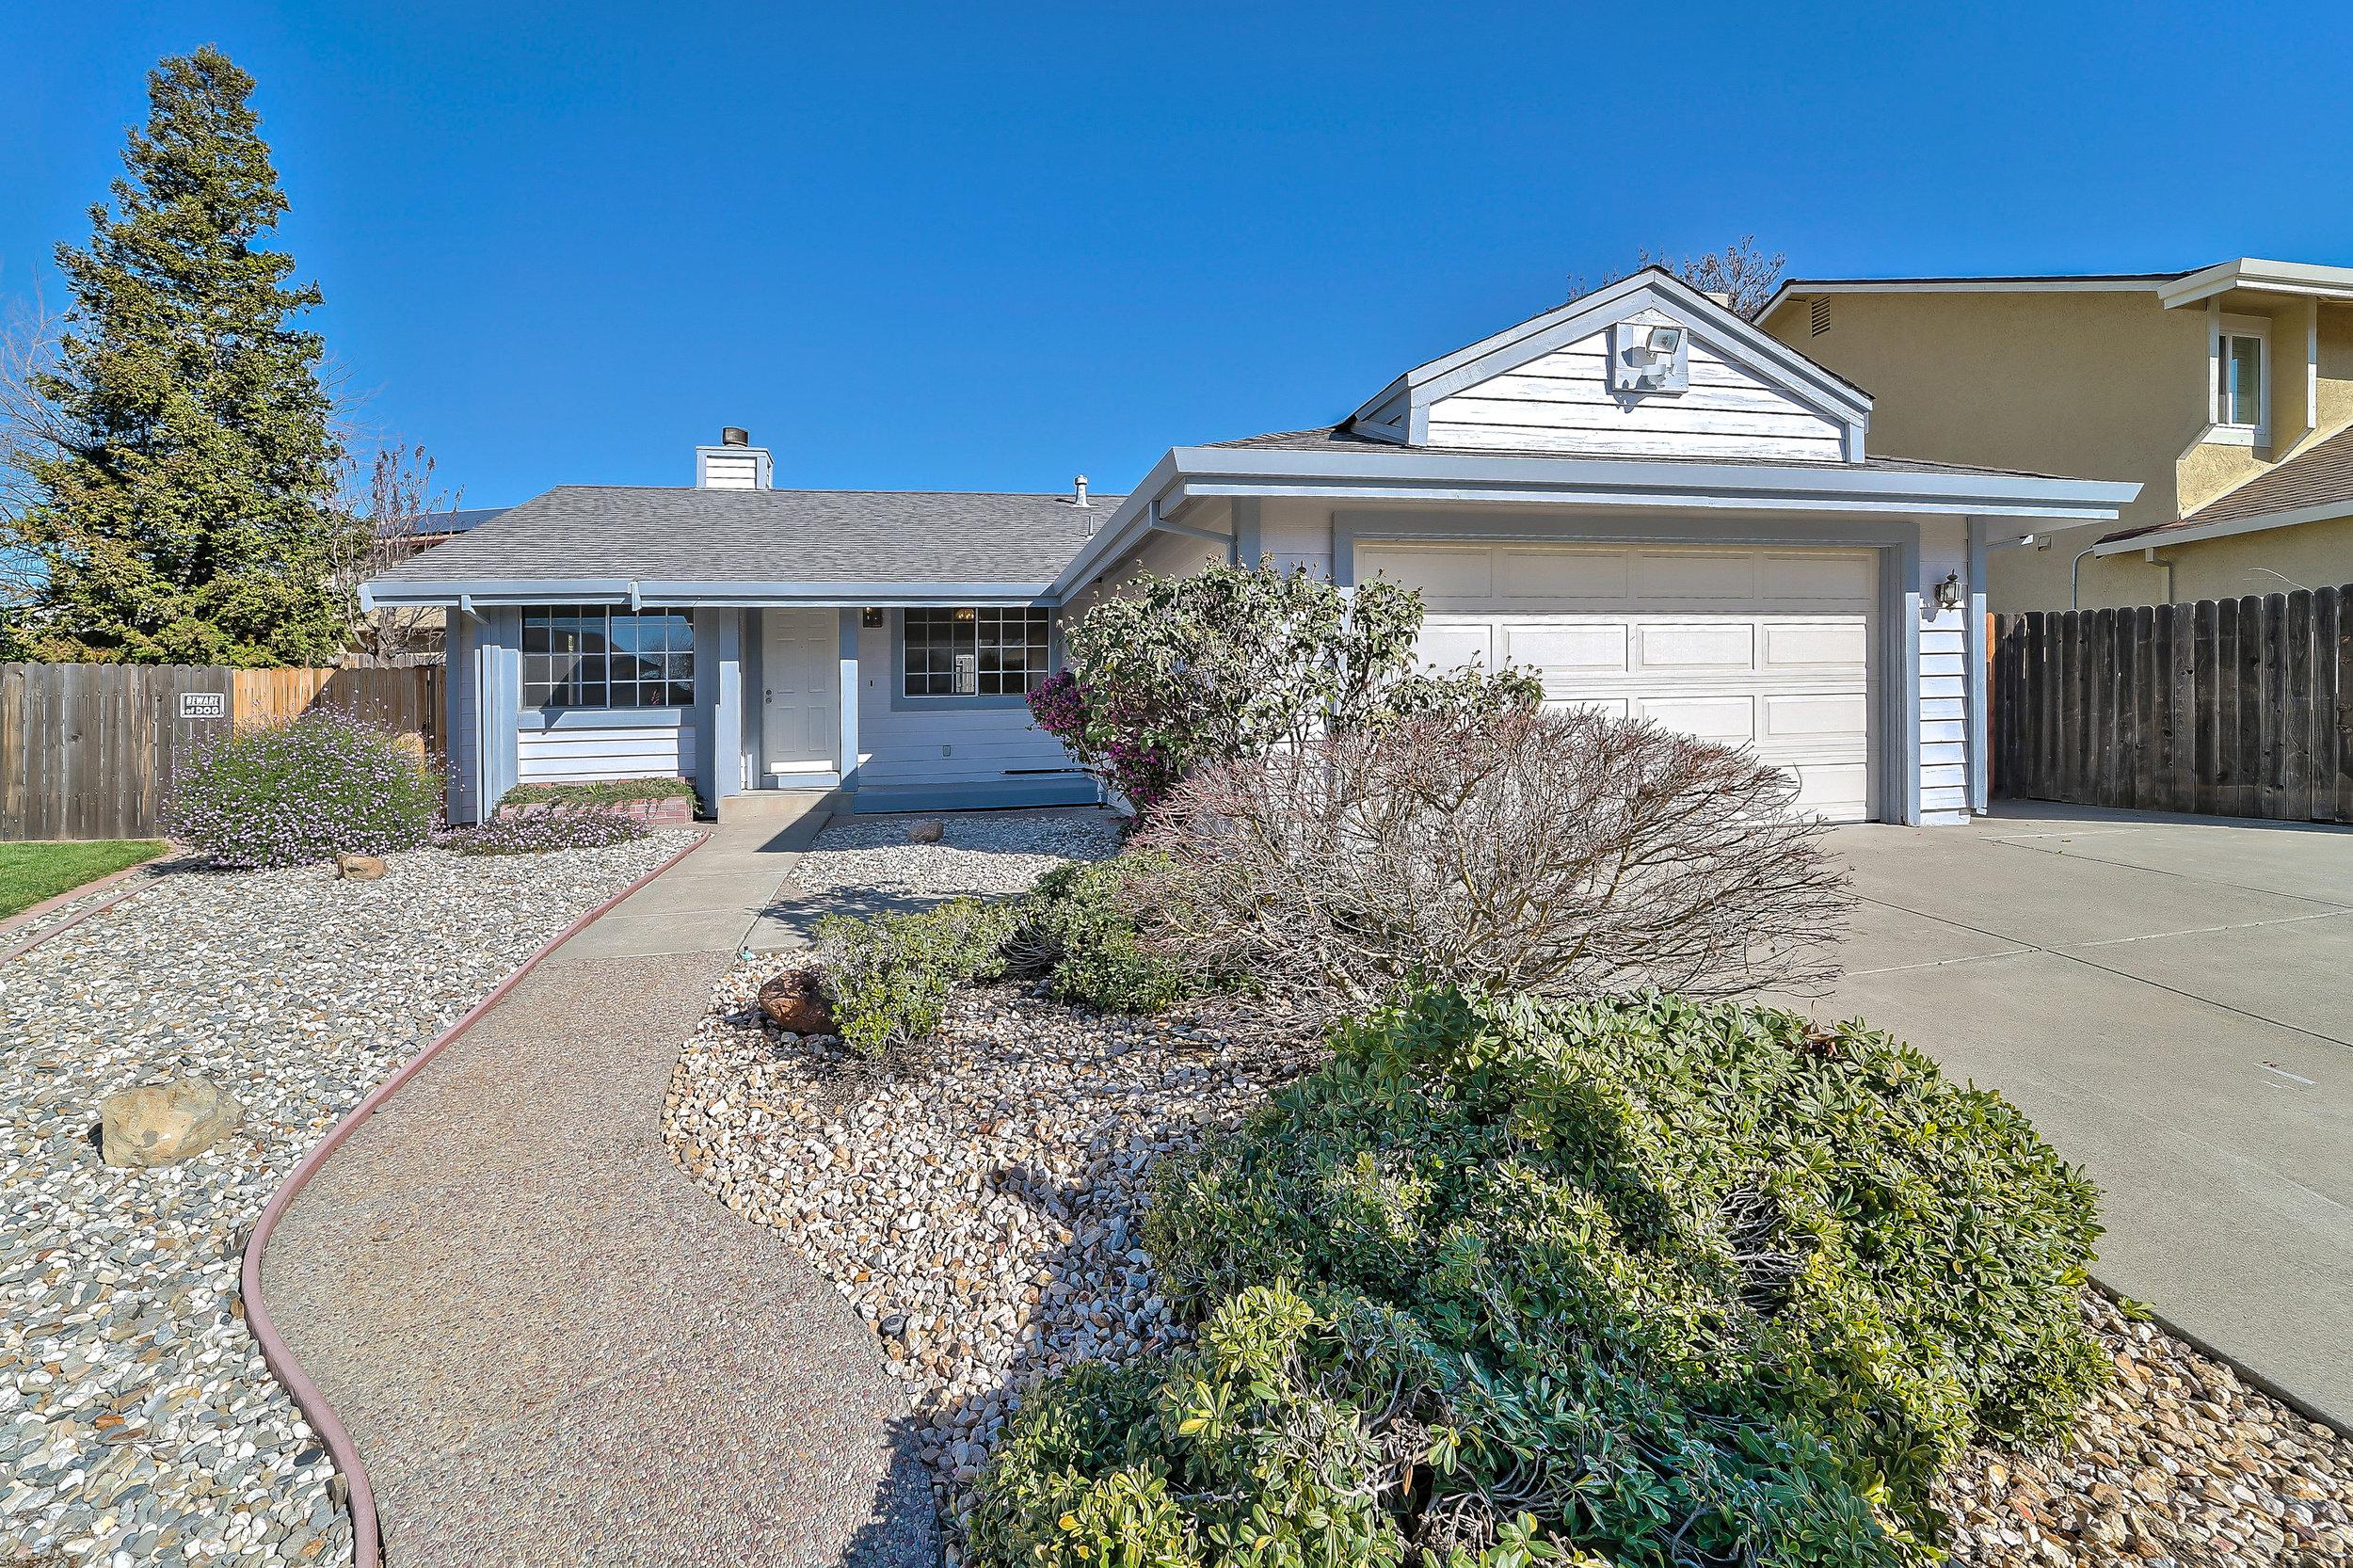 Sold at $435,000<strong>425 Tara Court, Vacaville</strong>